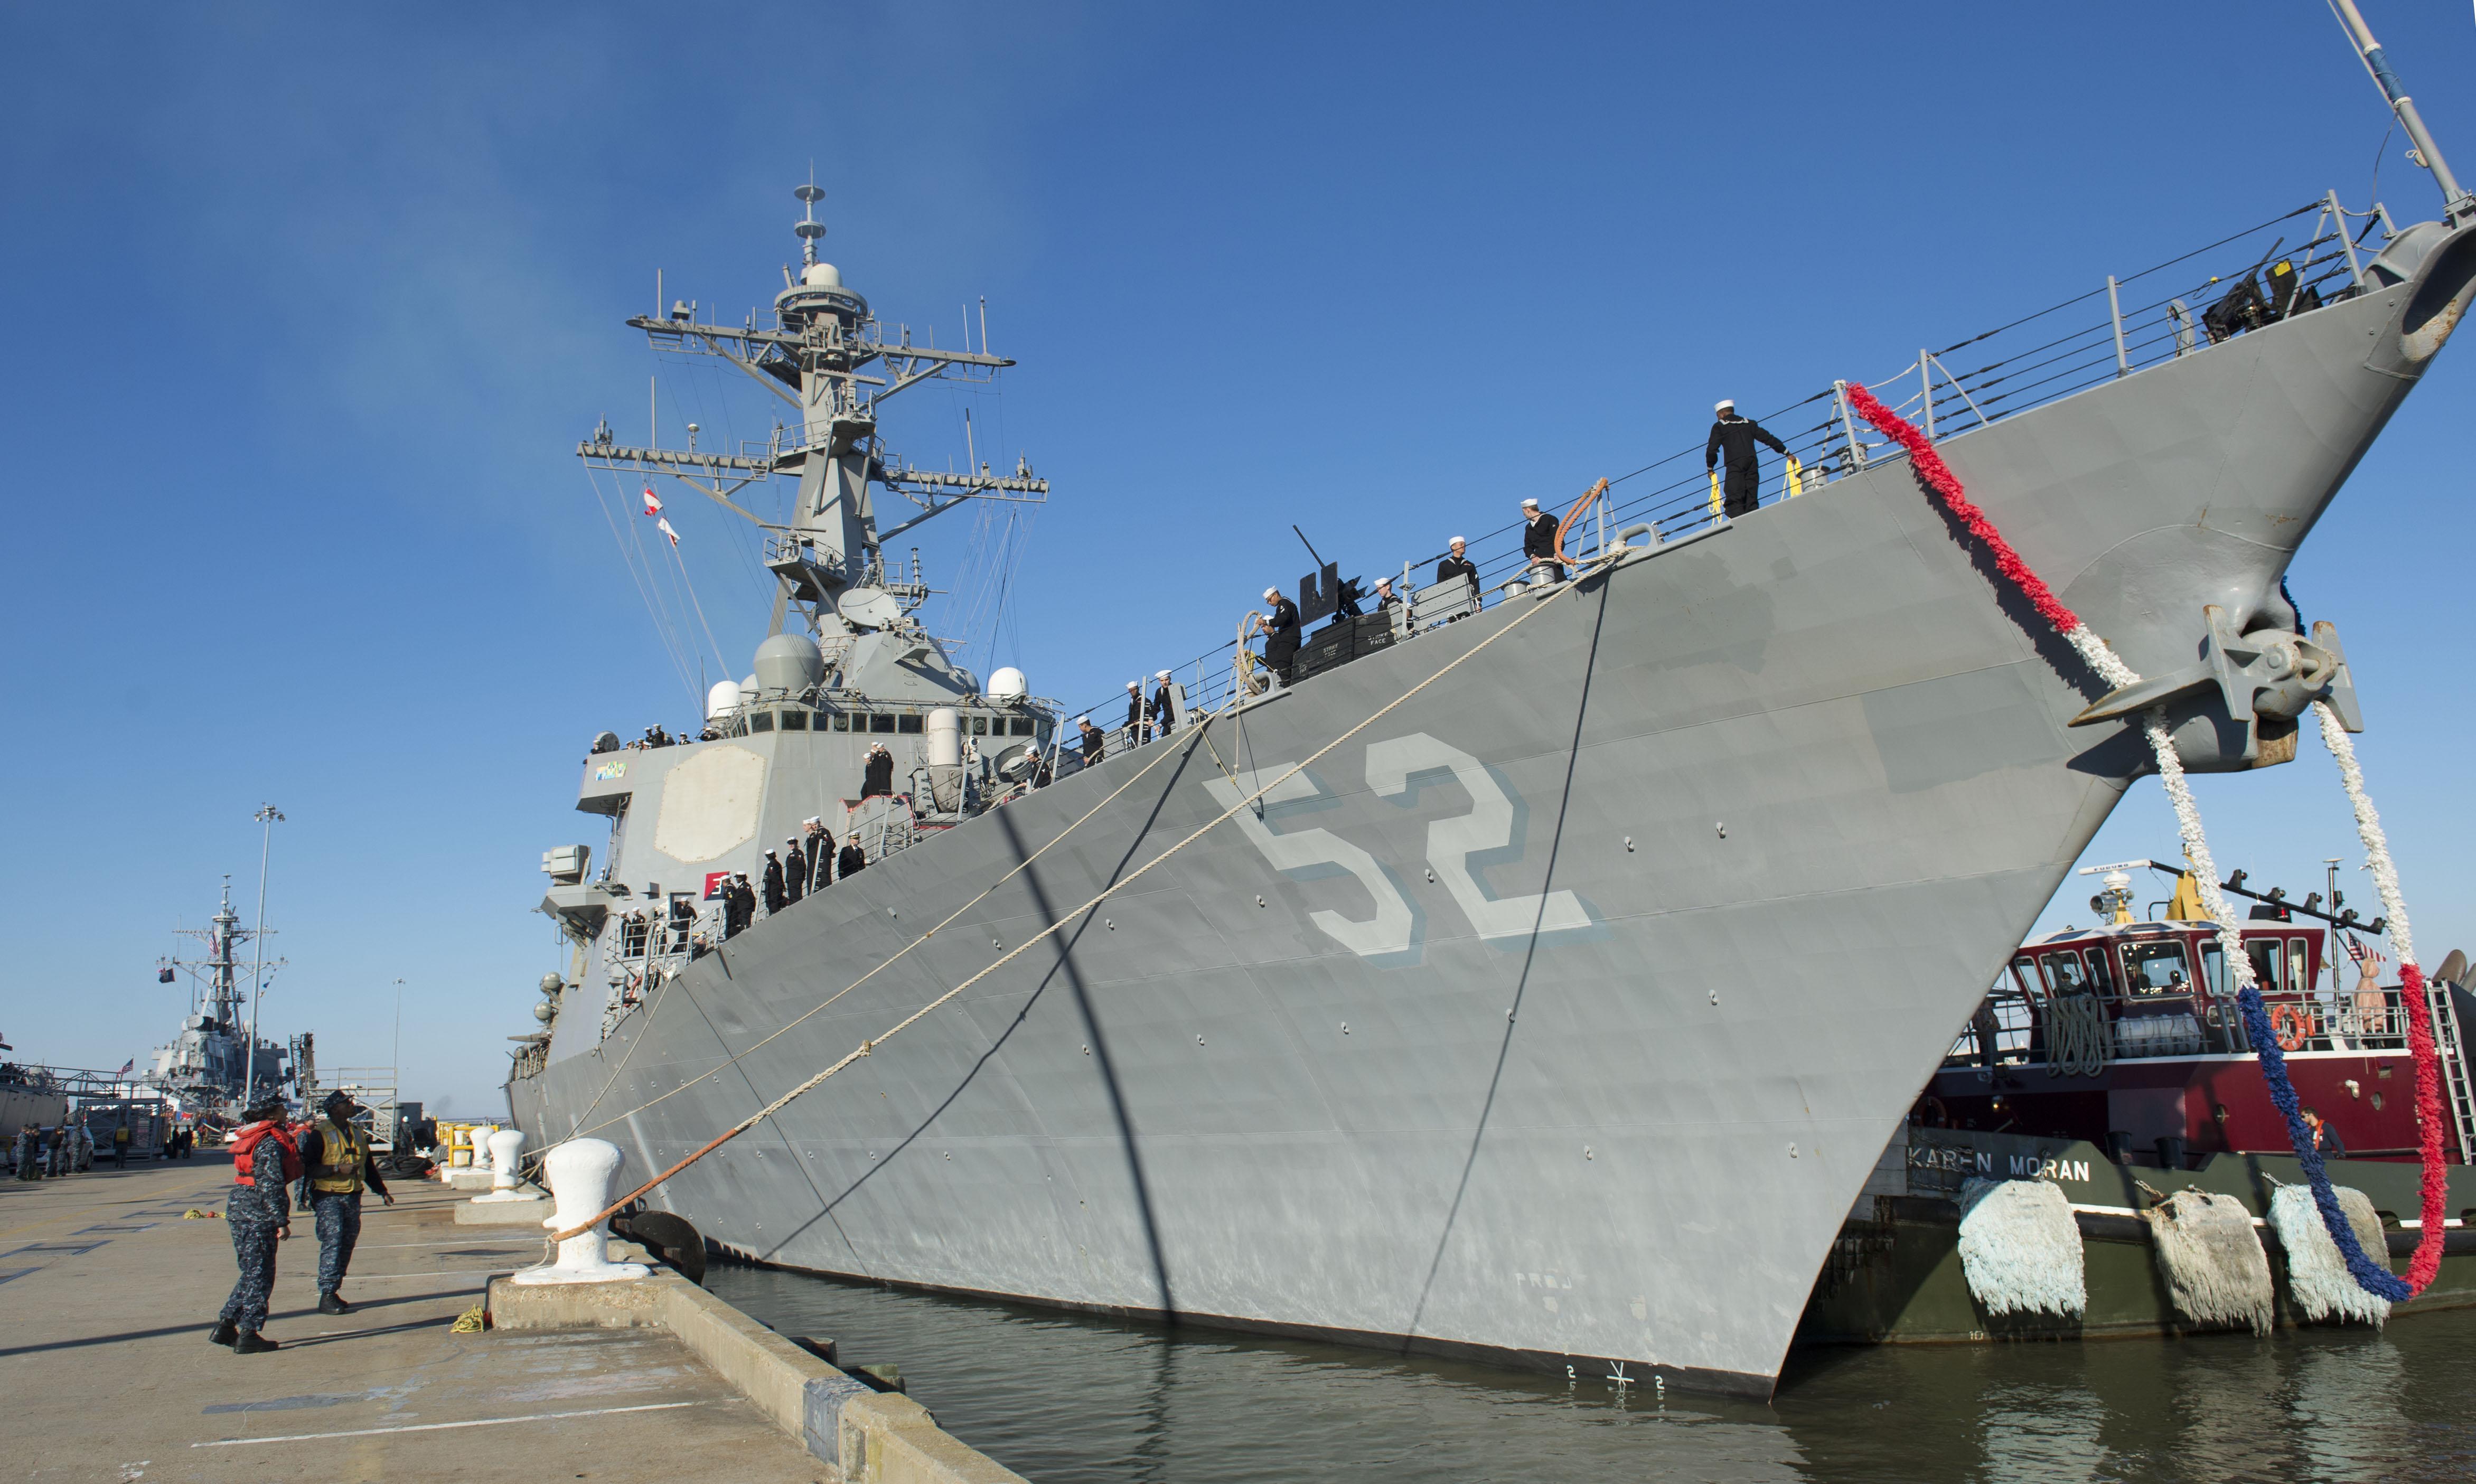 USS BARRY DDG-52 Ankunft Norfolk 08.11.2013Bild: U.S. Navy